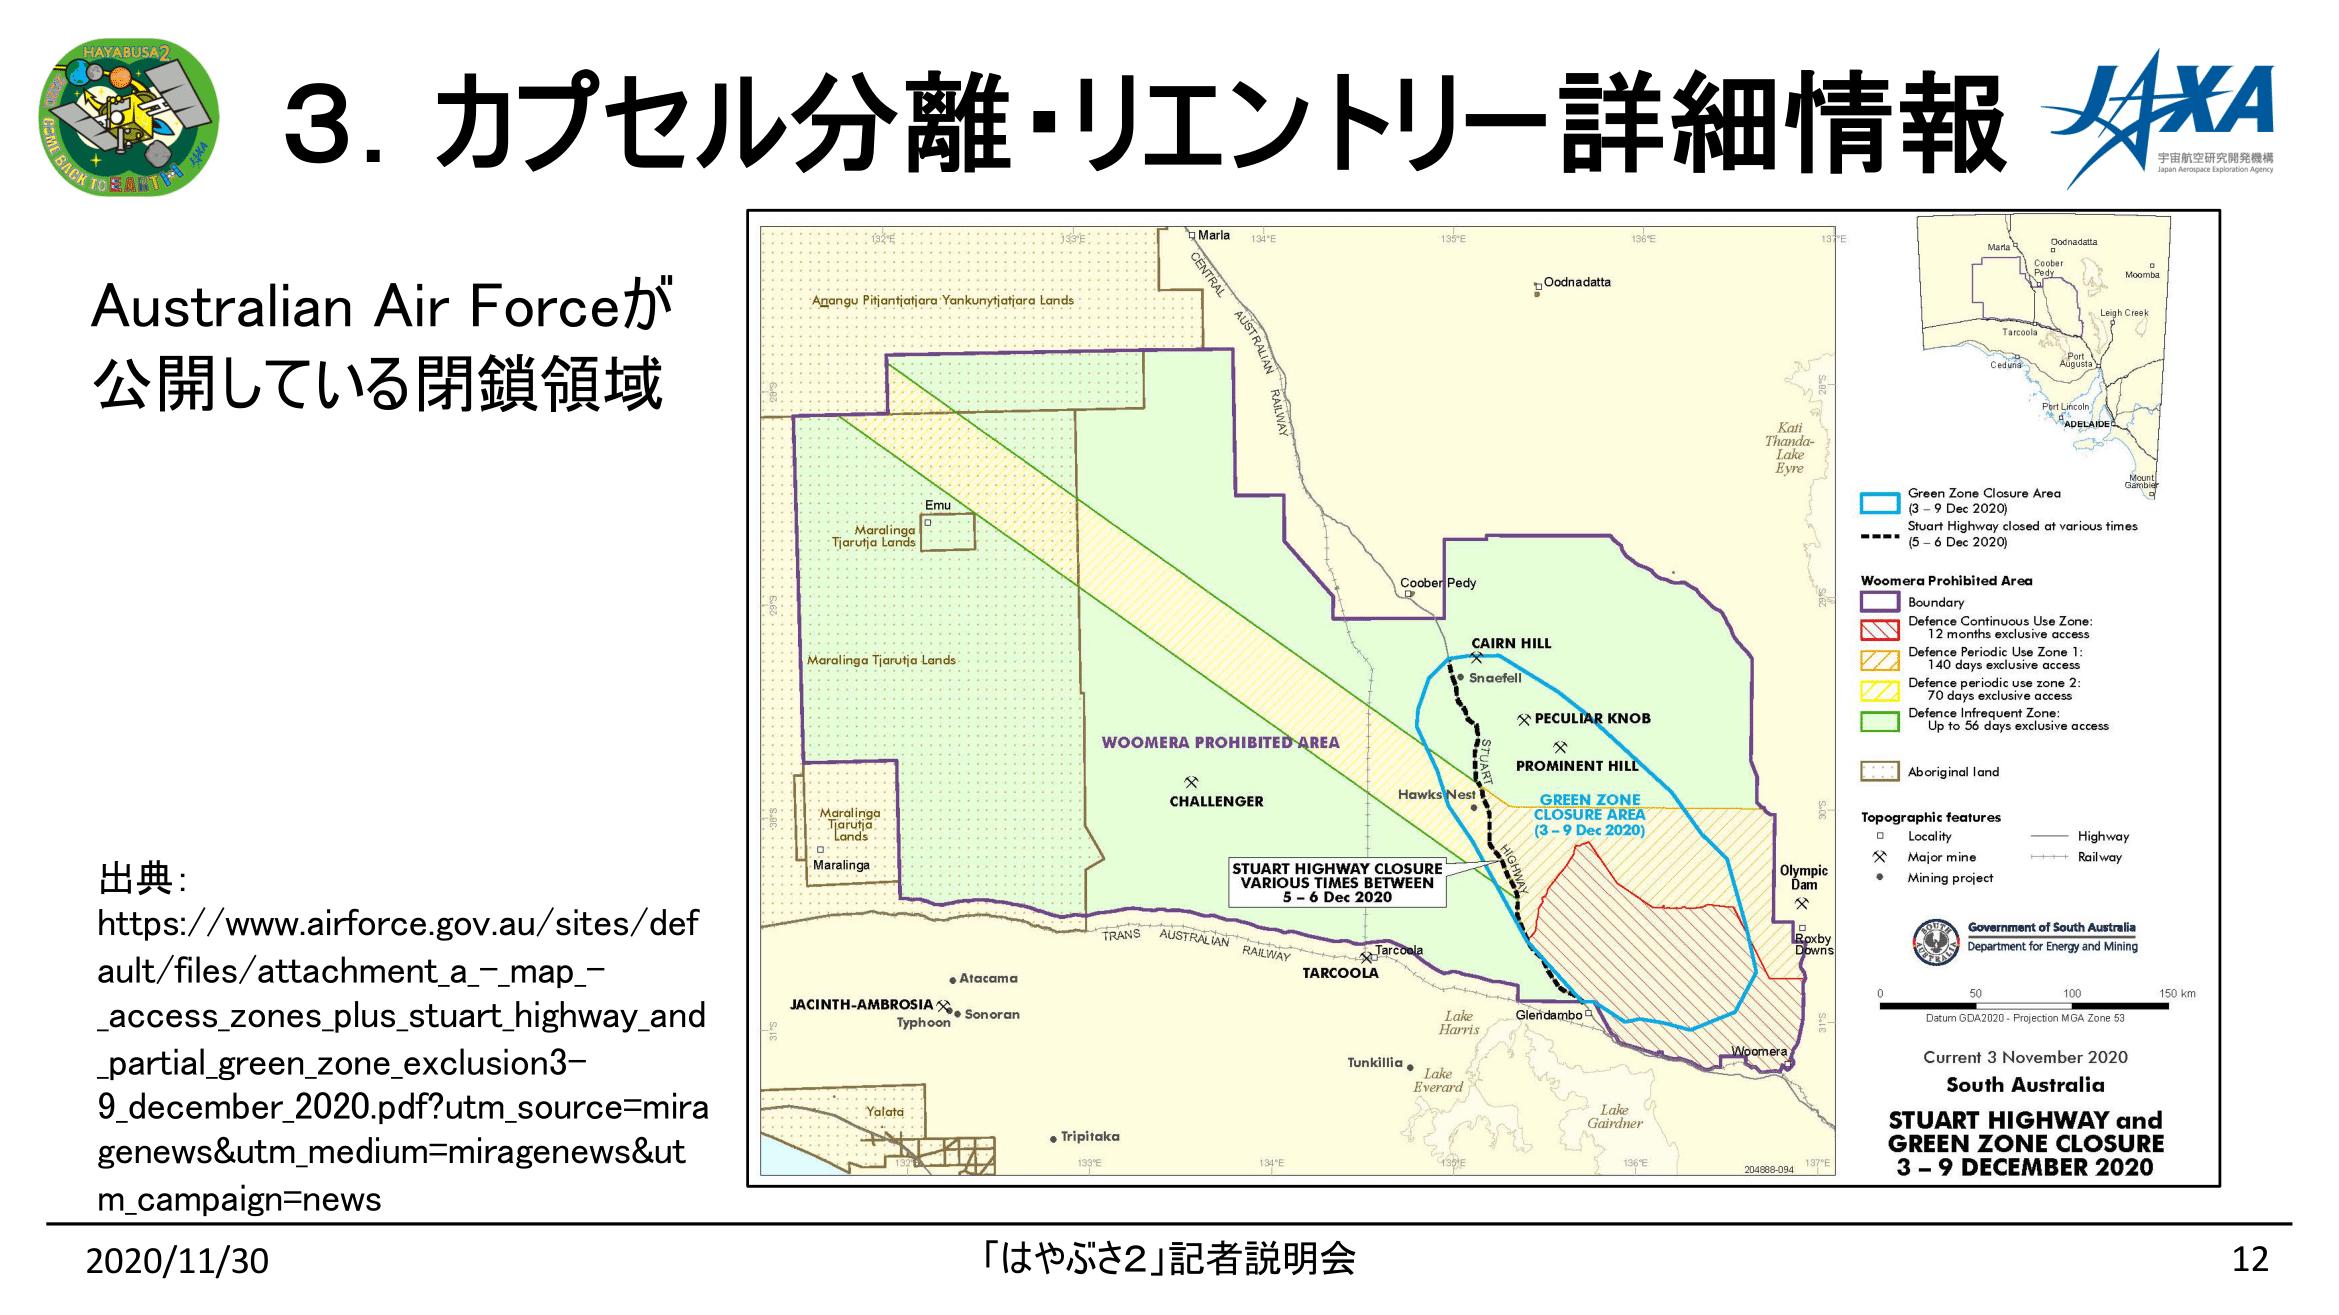 f:id:Imamura:20201130154117p:plain